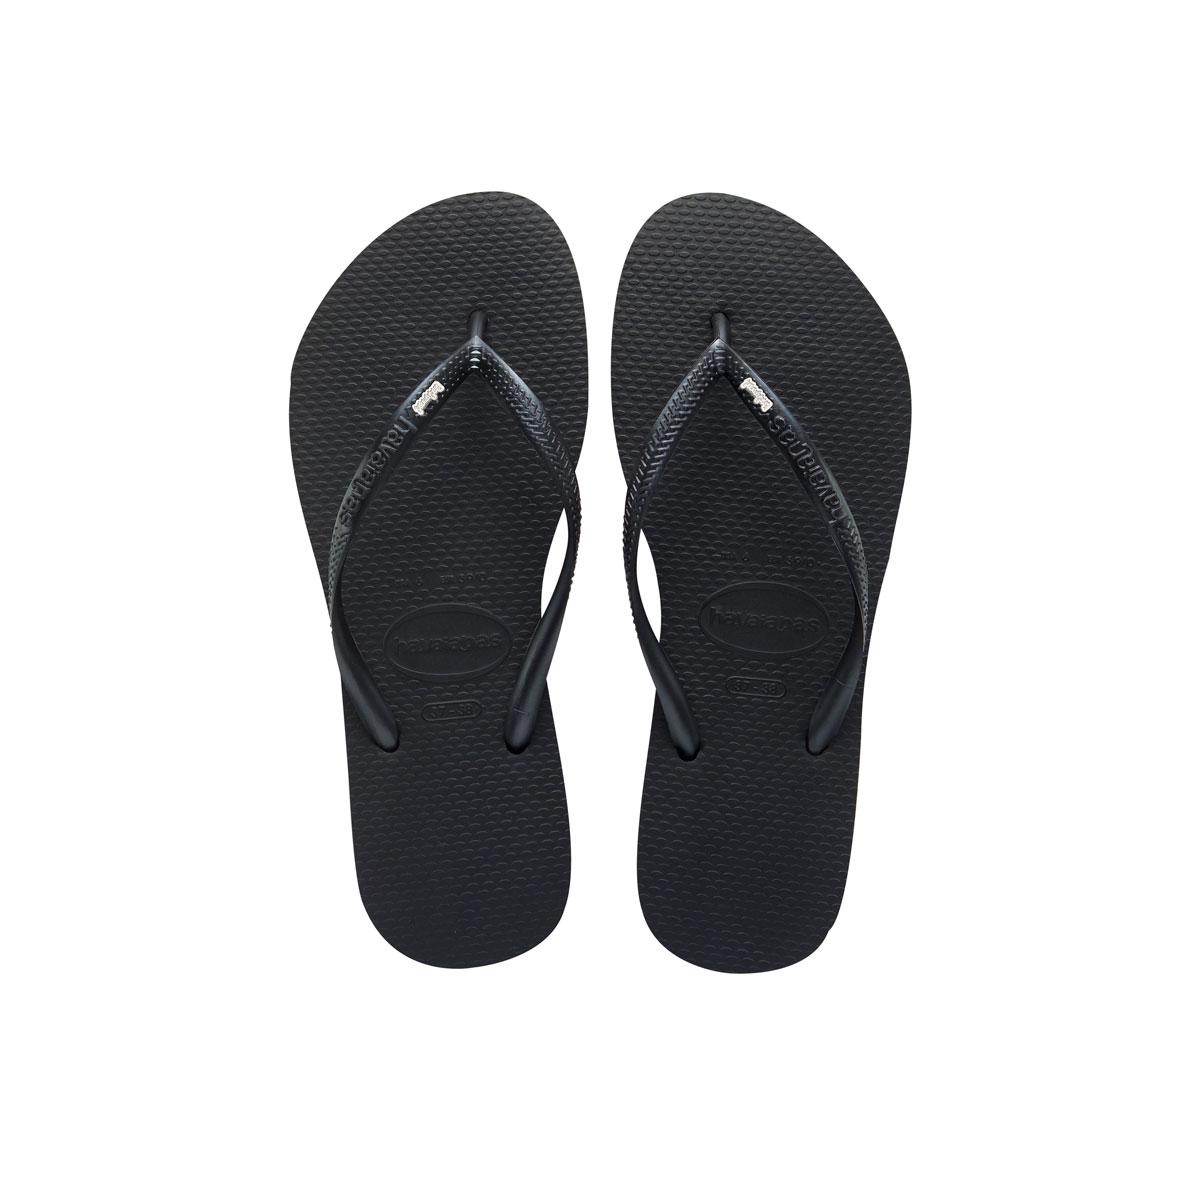 Havaianas Black Slim Flip Flops with Silver & White Bridesmaid Charm